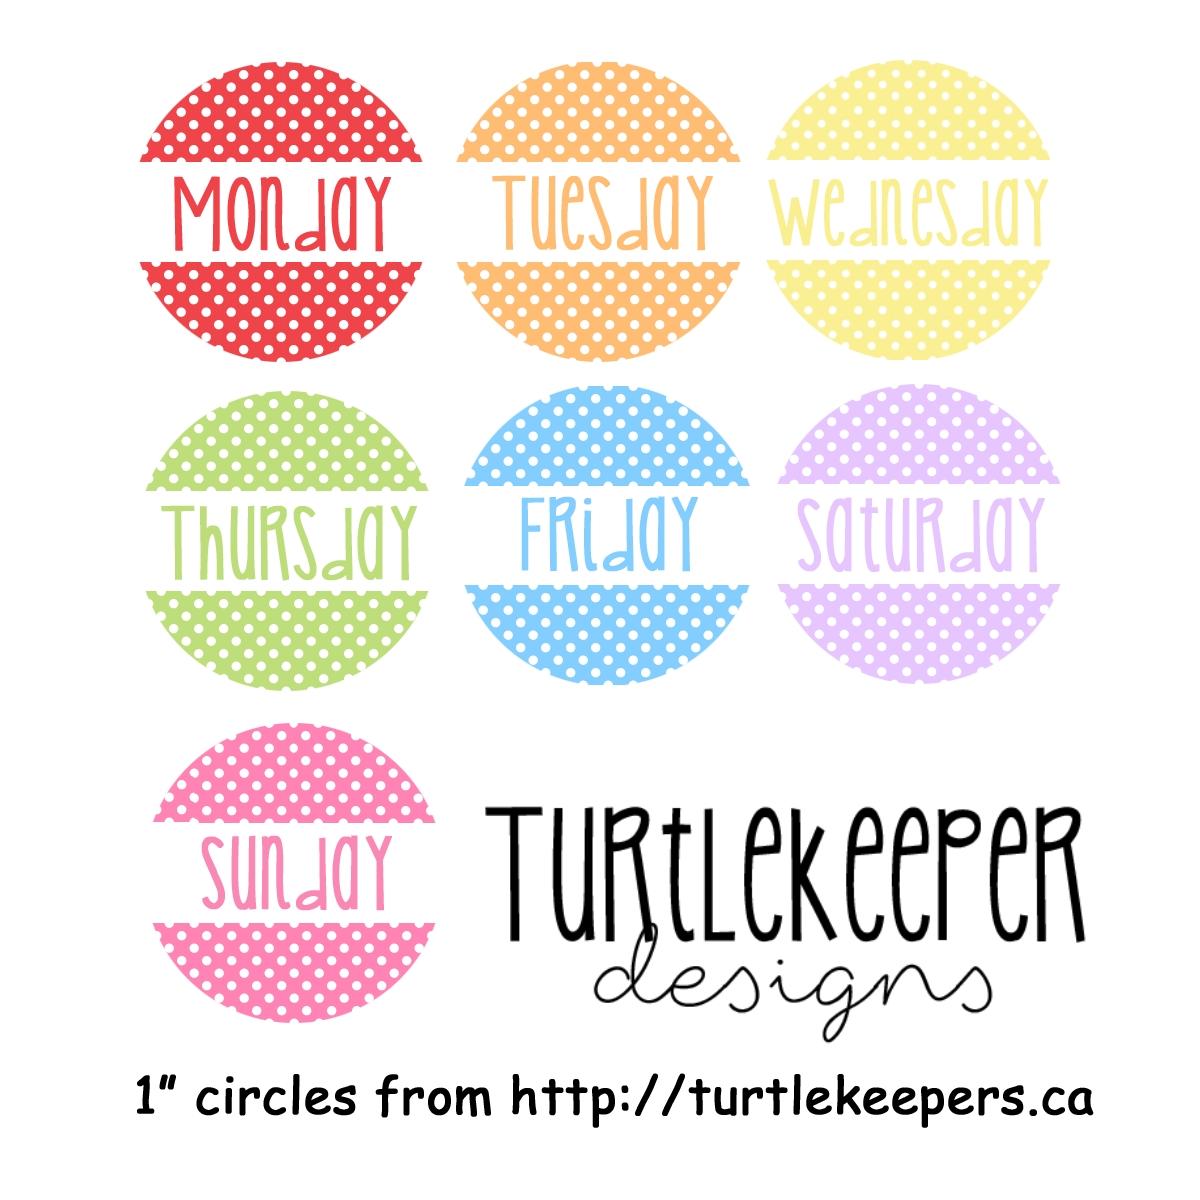 Turtlekeeper Designs : Days Of The Week Templates